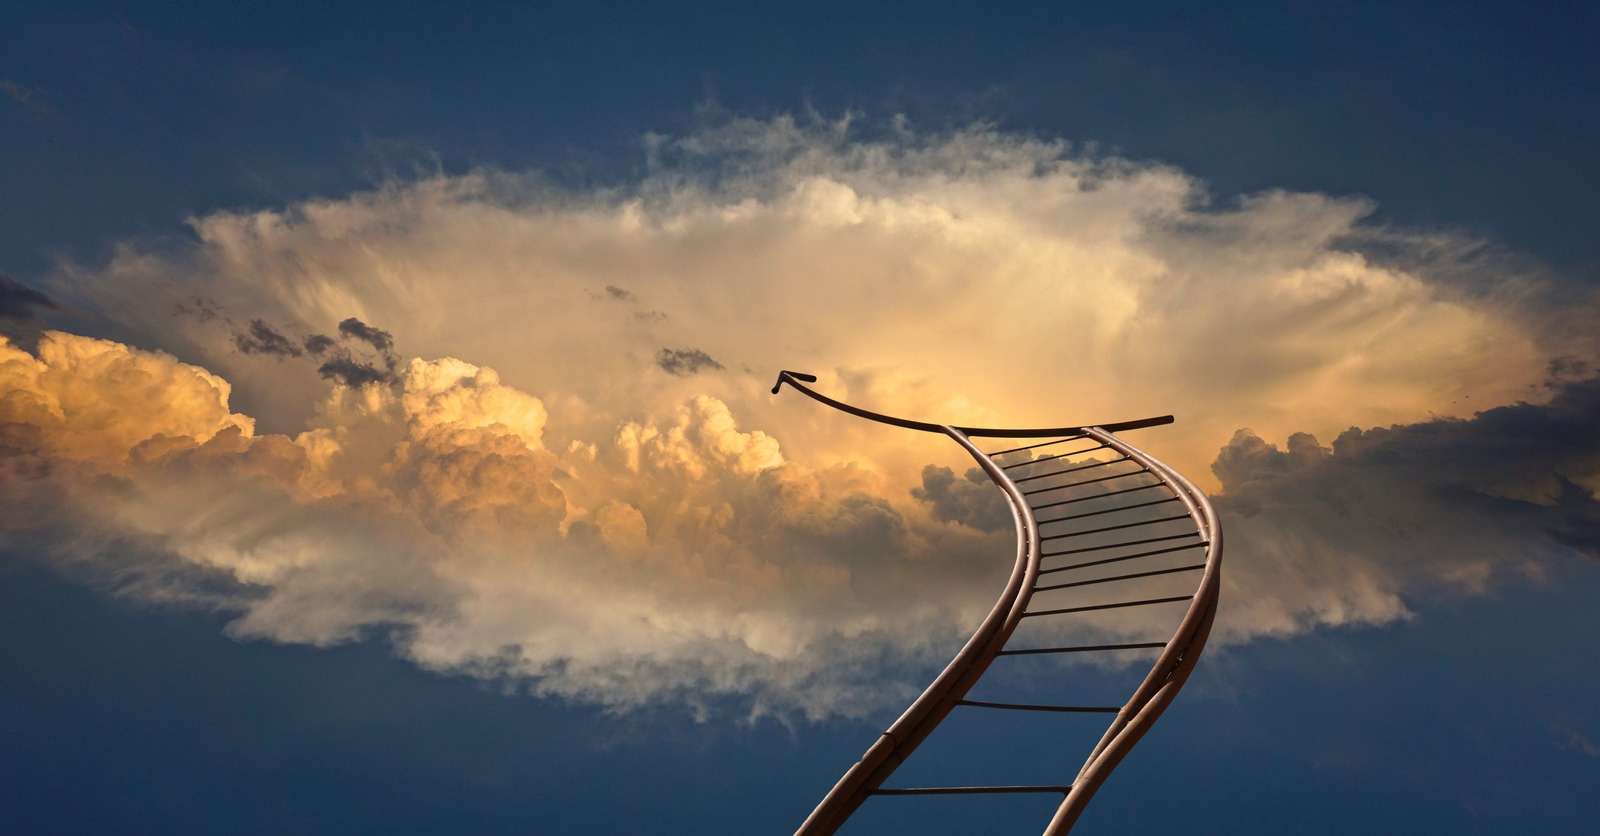 Foto von geralt--9301: https://www.canva.com/photos/MADQ5H7as2c-metallic-ladder-and-cloud-in-the-sky/